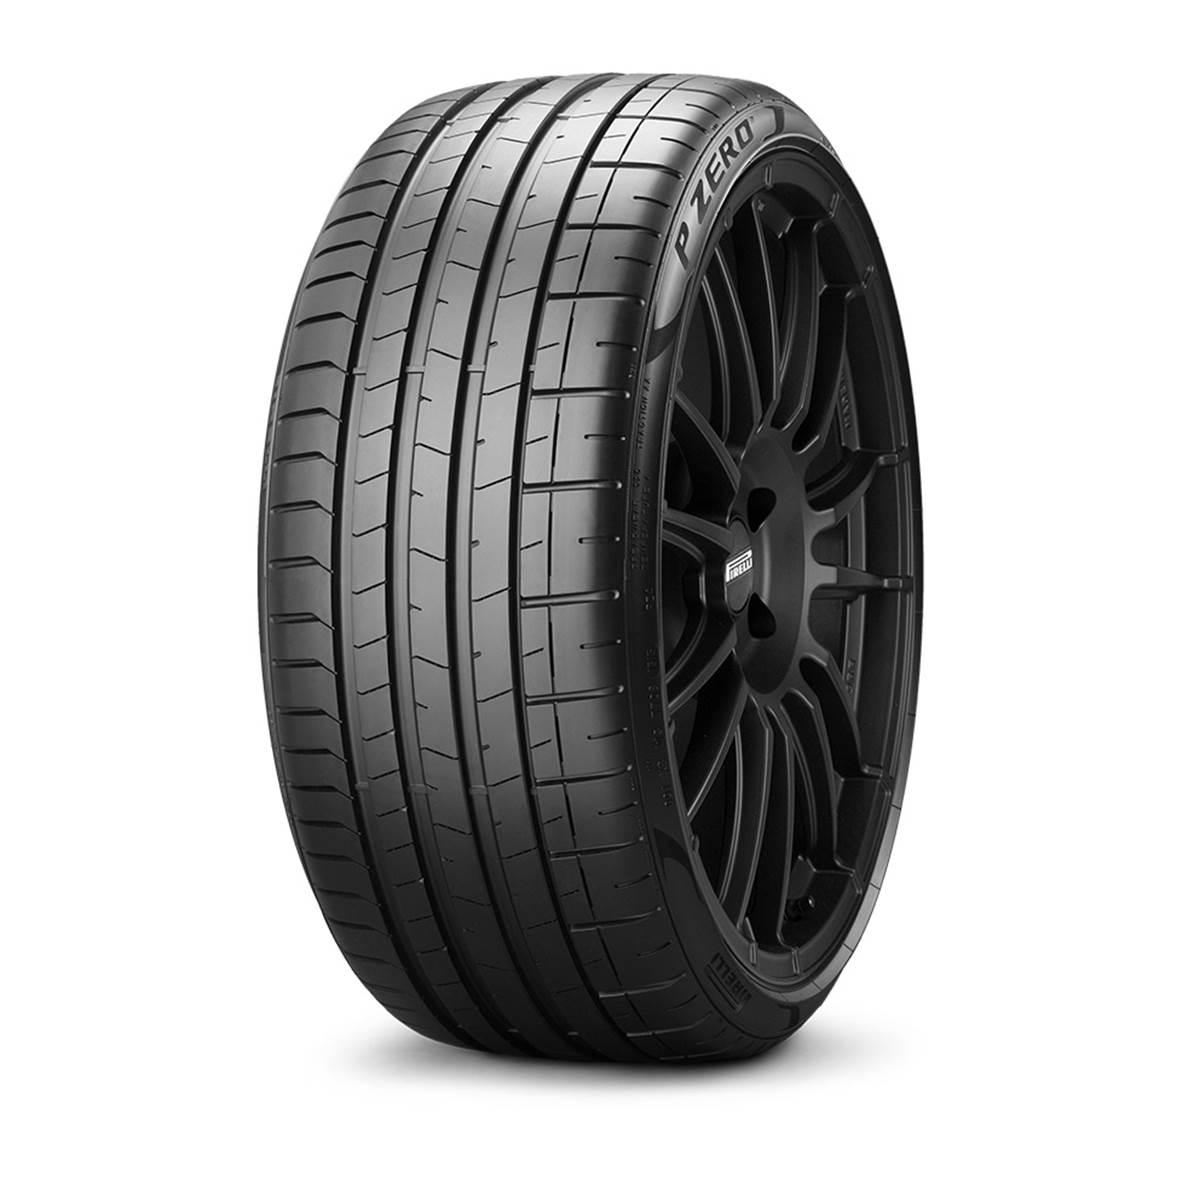 Pneu Pirelli 235/50R19 99W Pzero